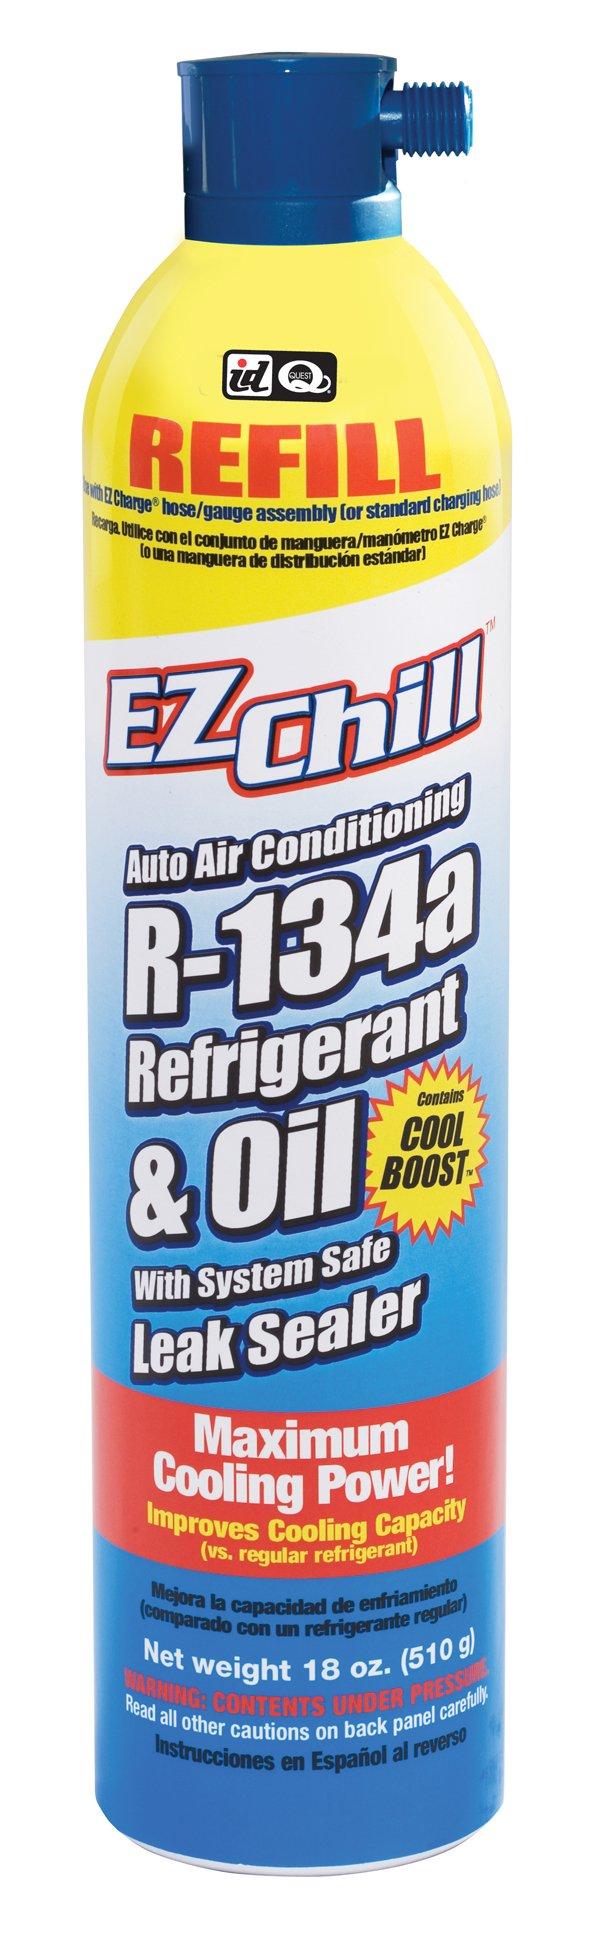 Interdynamics EZ Chill Automotive Refrigerant R-134a (18 ounces), MAC-134RFL by Interdynamics